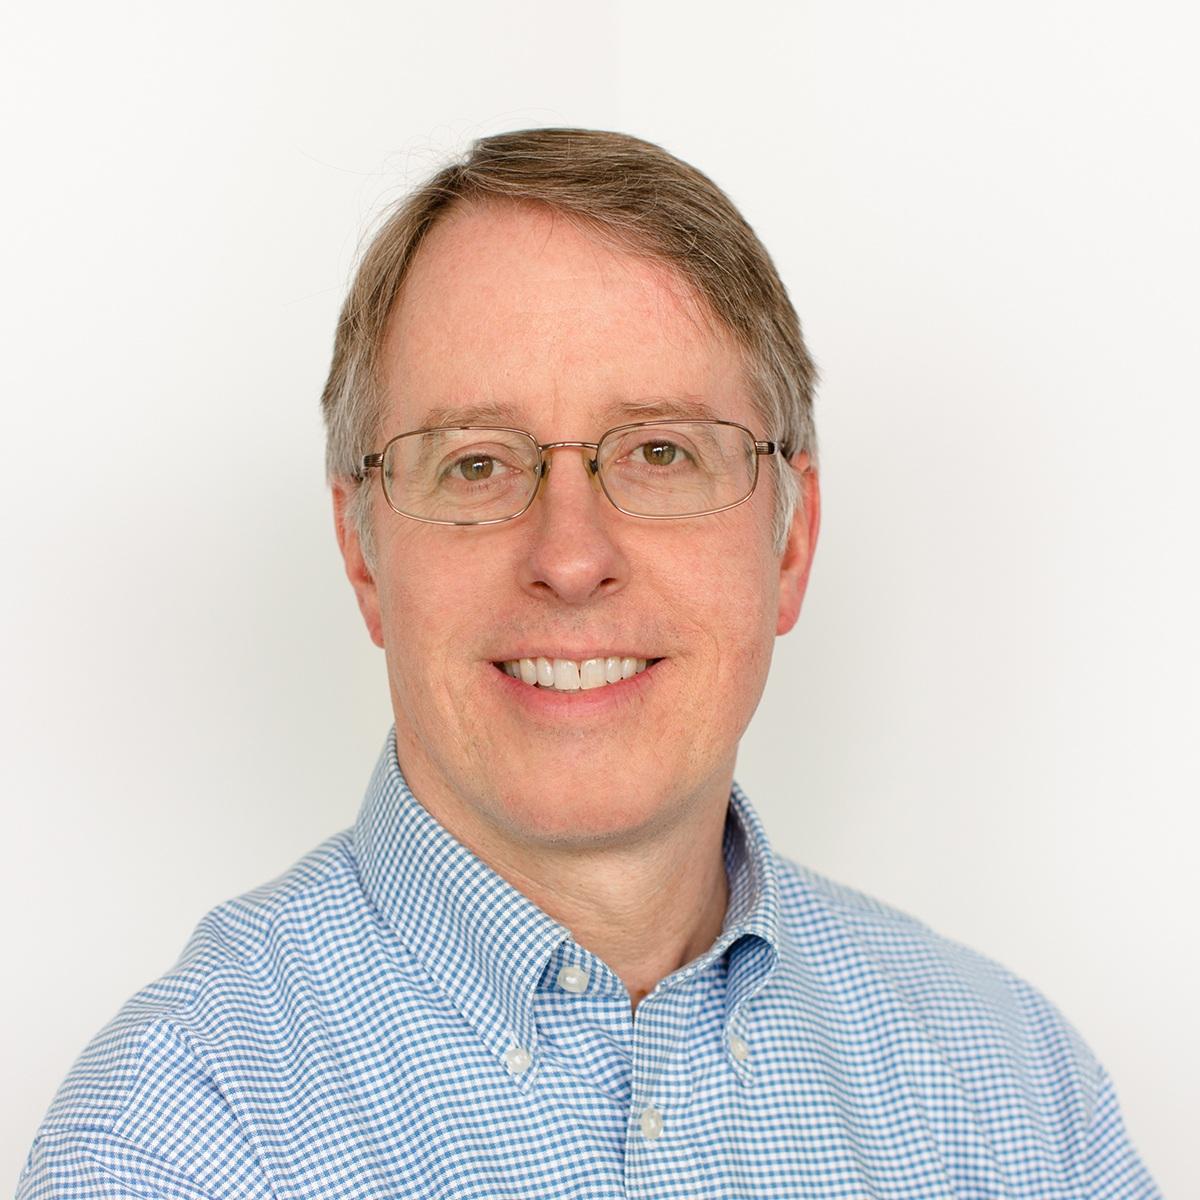 TIM QUILLIN - PARTNER/COOFinancial Planner & Retirement Plan AdvisorChartered Financial AnalystMBA, University of IowaFormer U.S. Army Officer